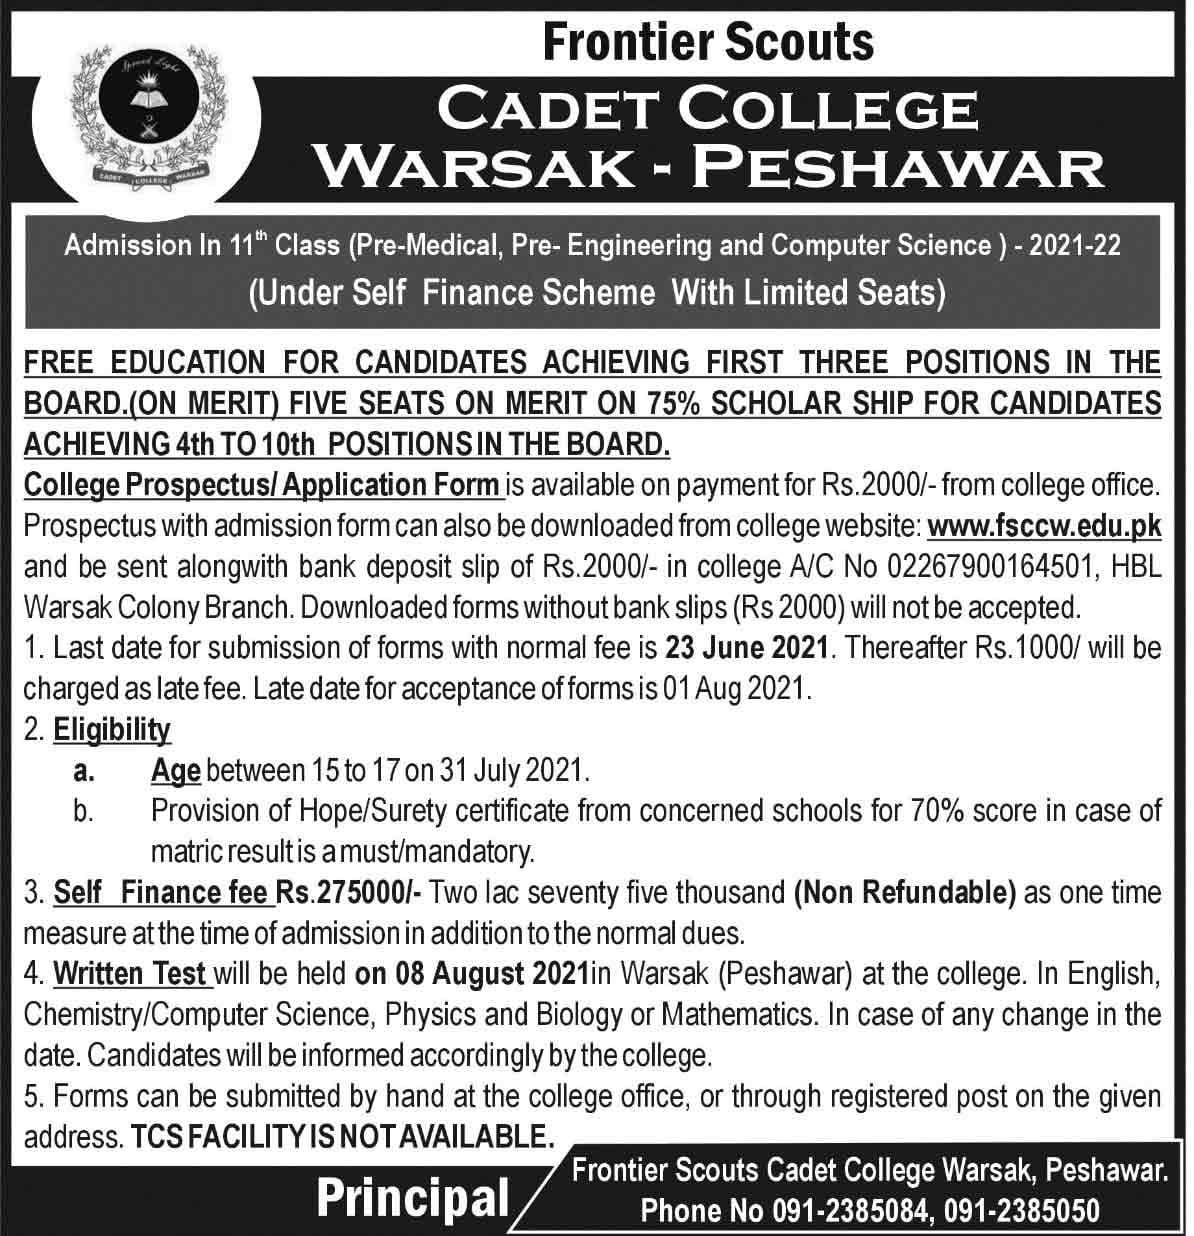 Cadet-College-Warsak-Peshawar-Admission-2021